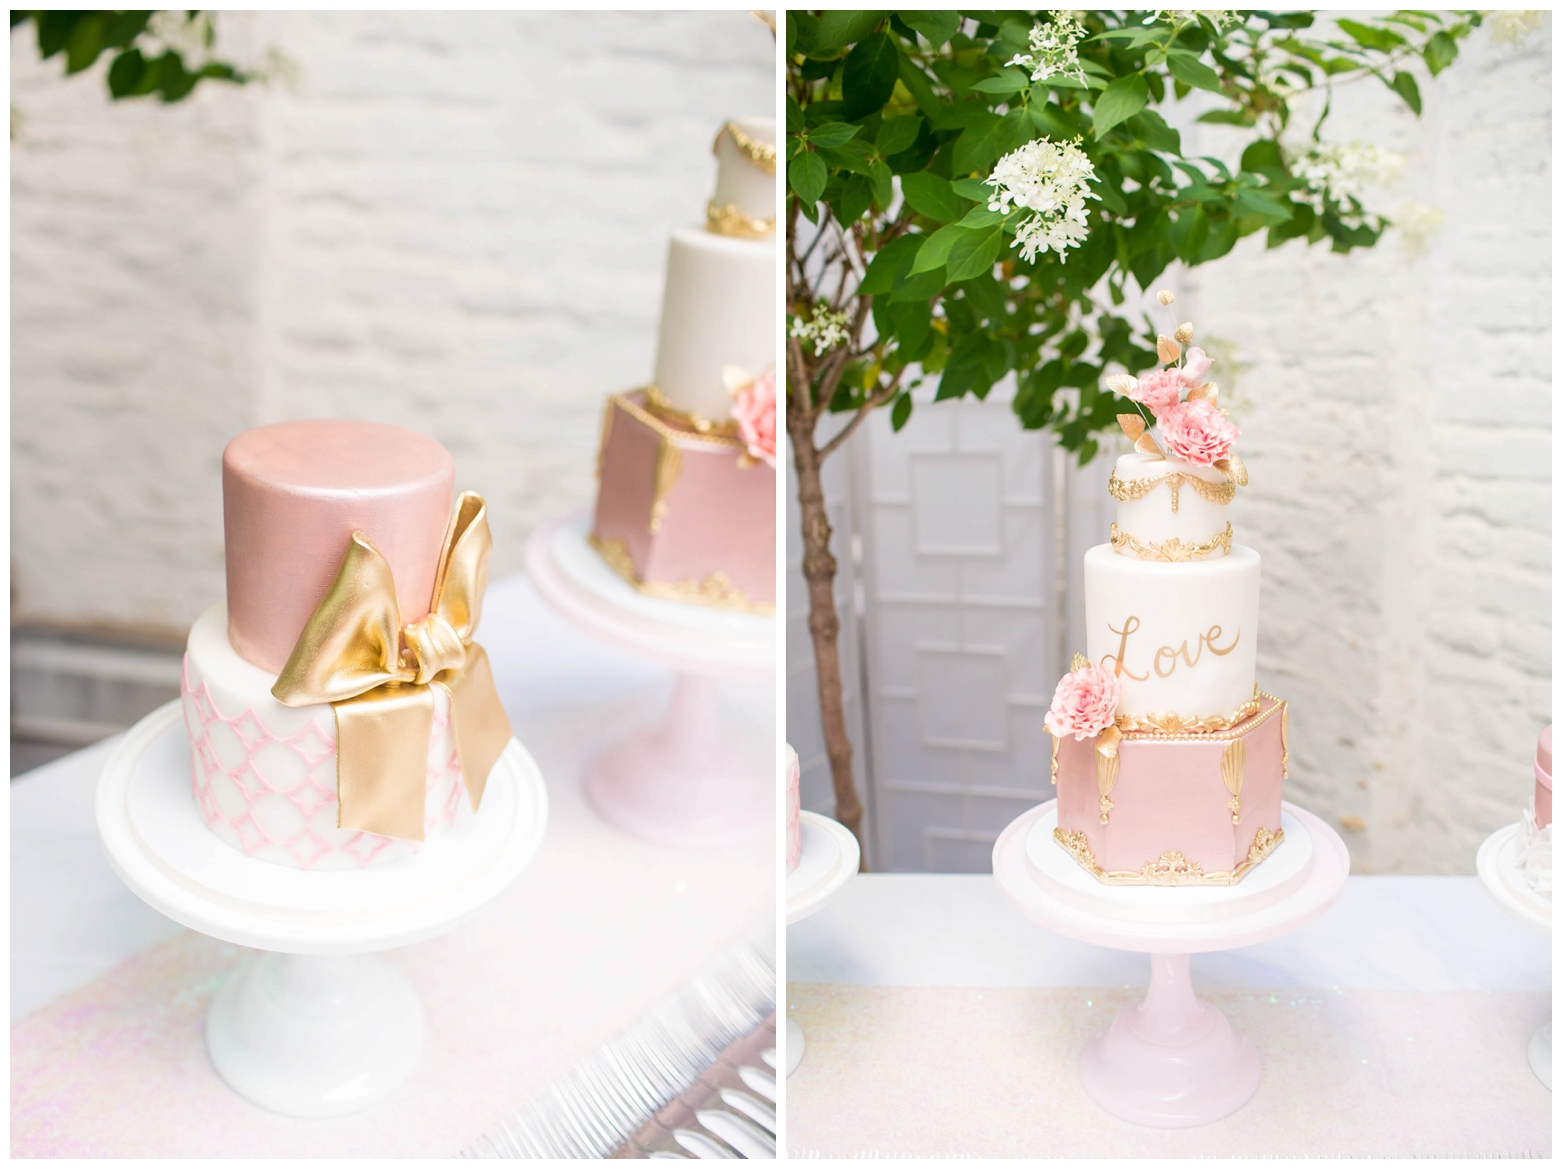 The Caroline Doll Cake